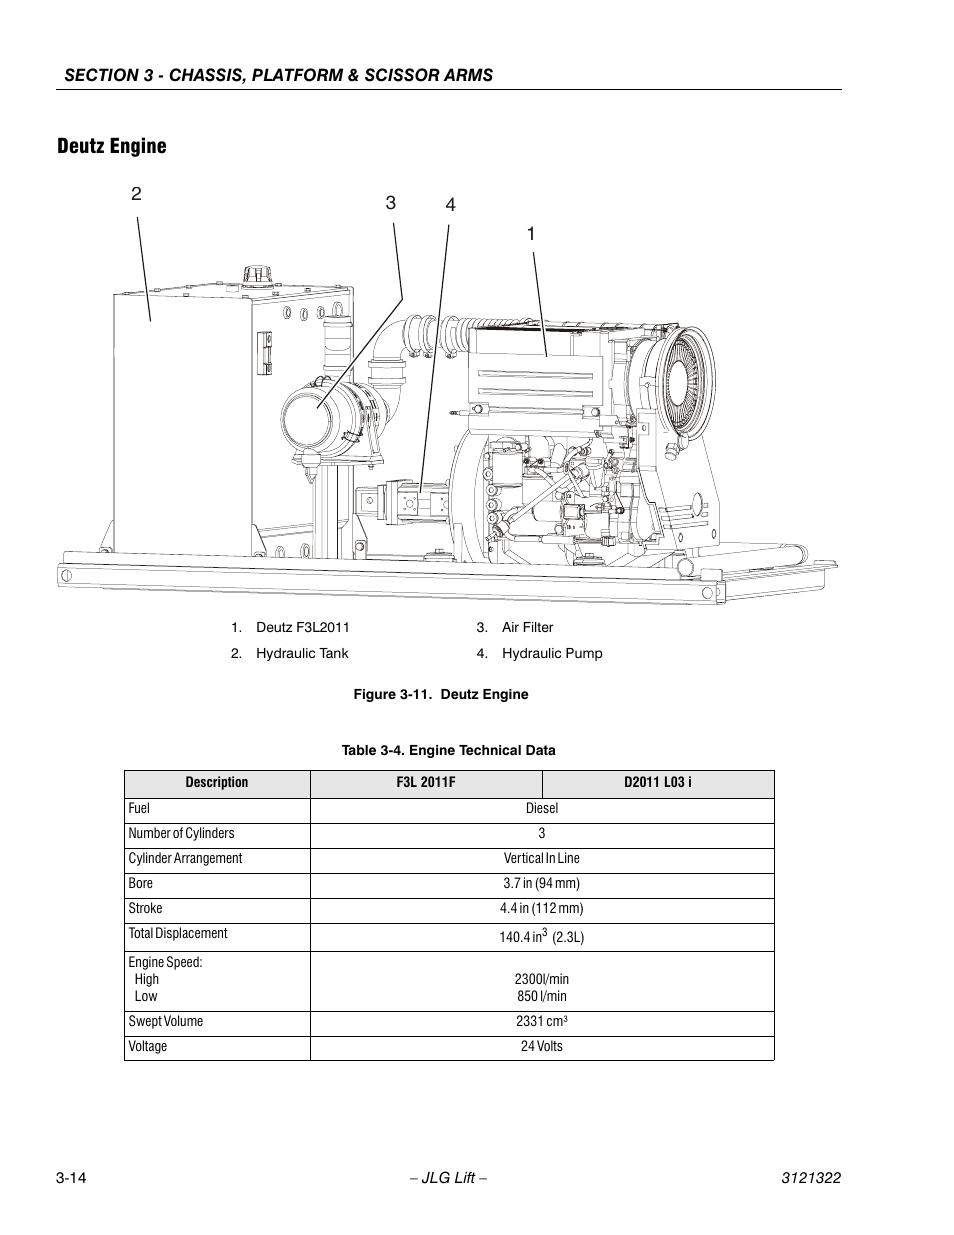 Deutz engine, Deutz engine -14, Engine technical data -14 | JLG 67SL Service  Manual User Manual | Page 46 / 152